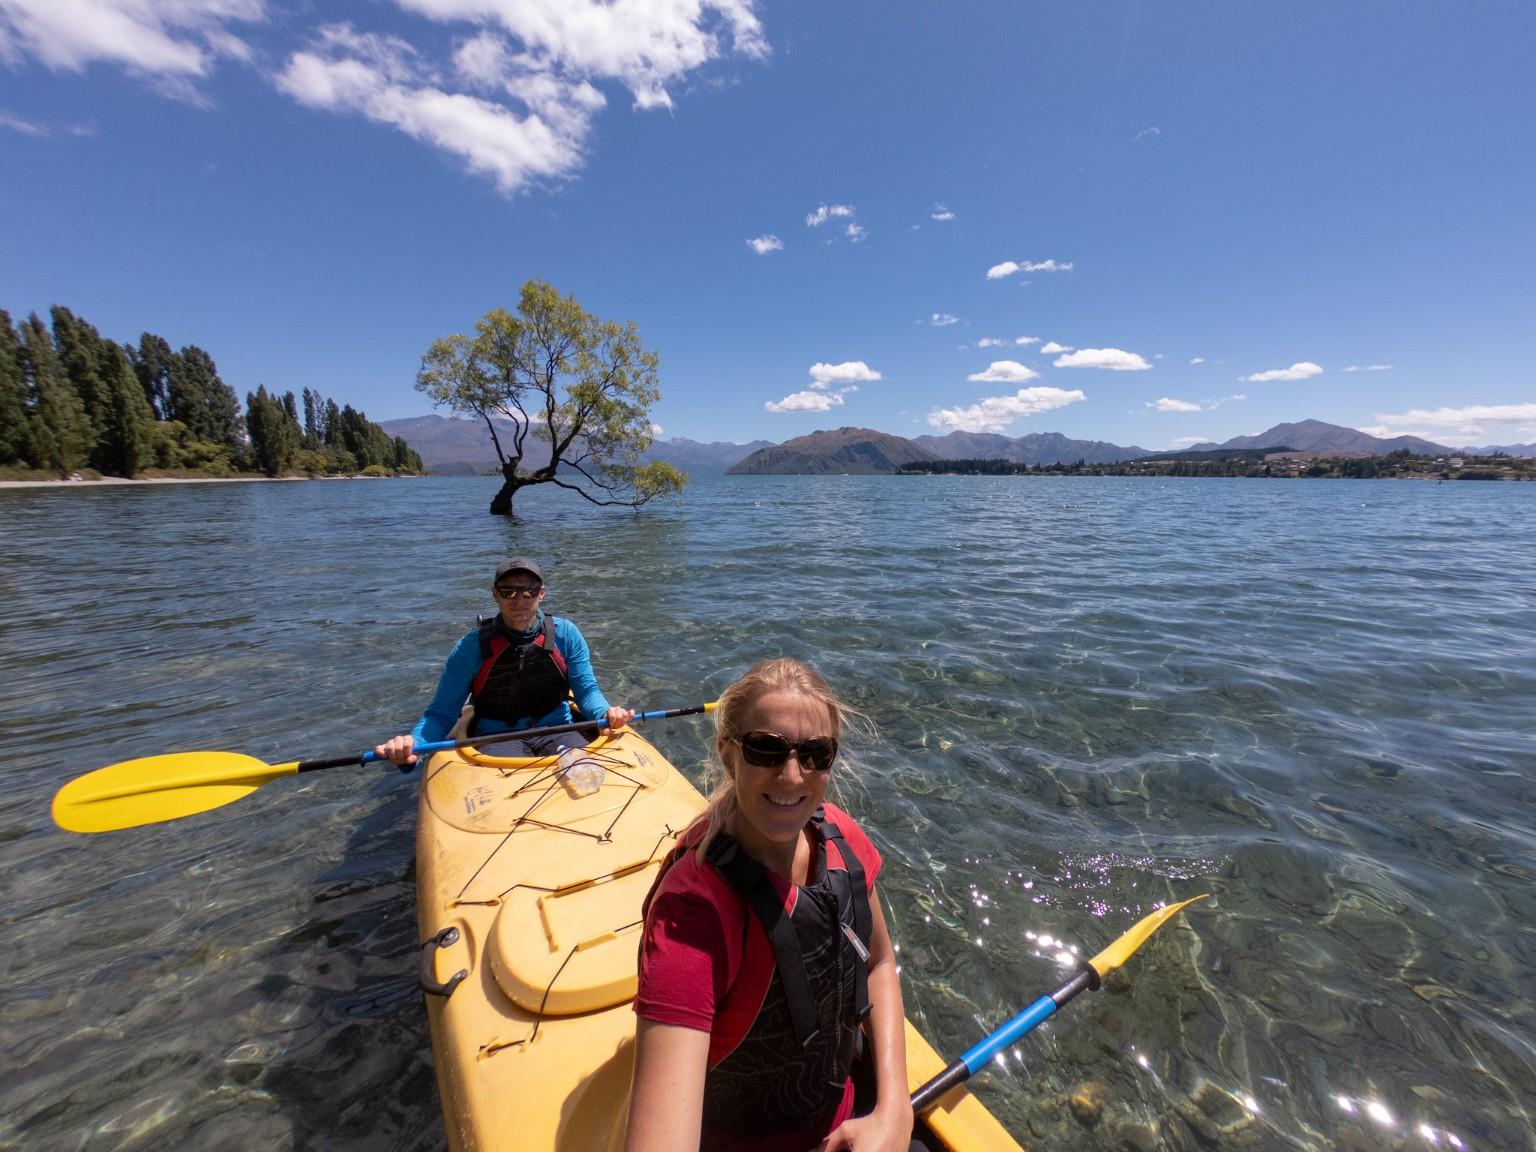 Kajakfahren auf dem Lake Wanaka